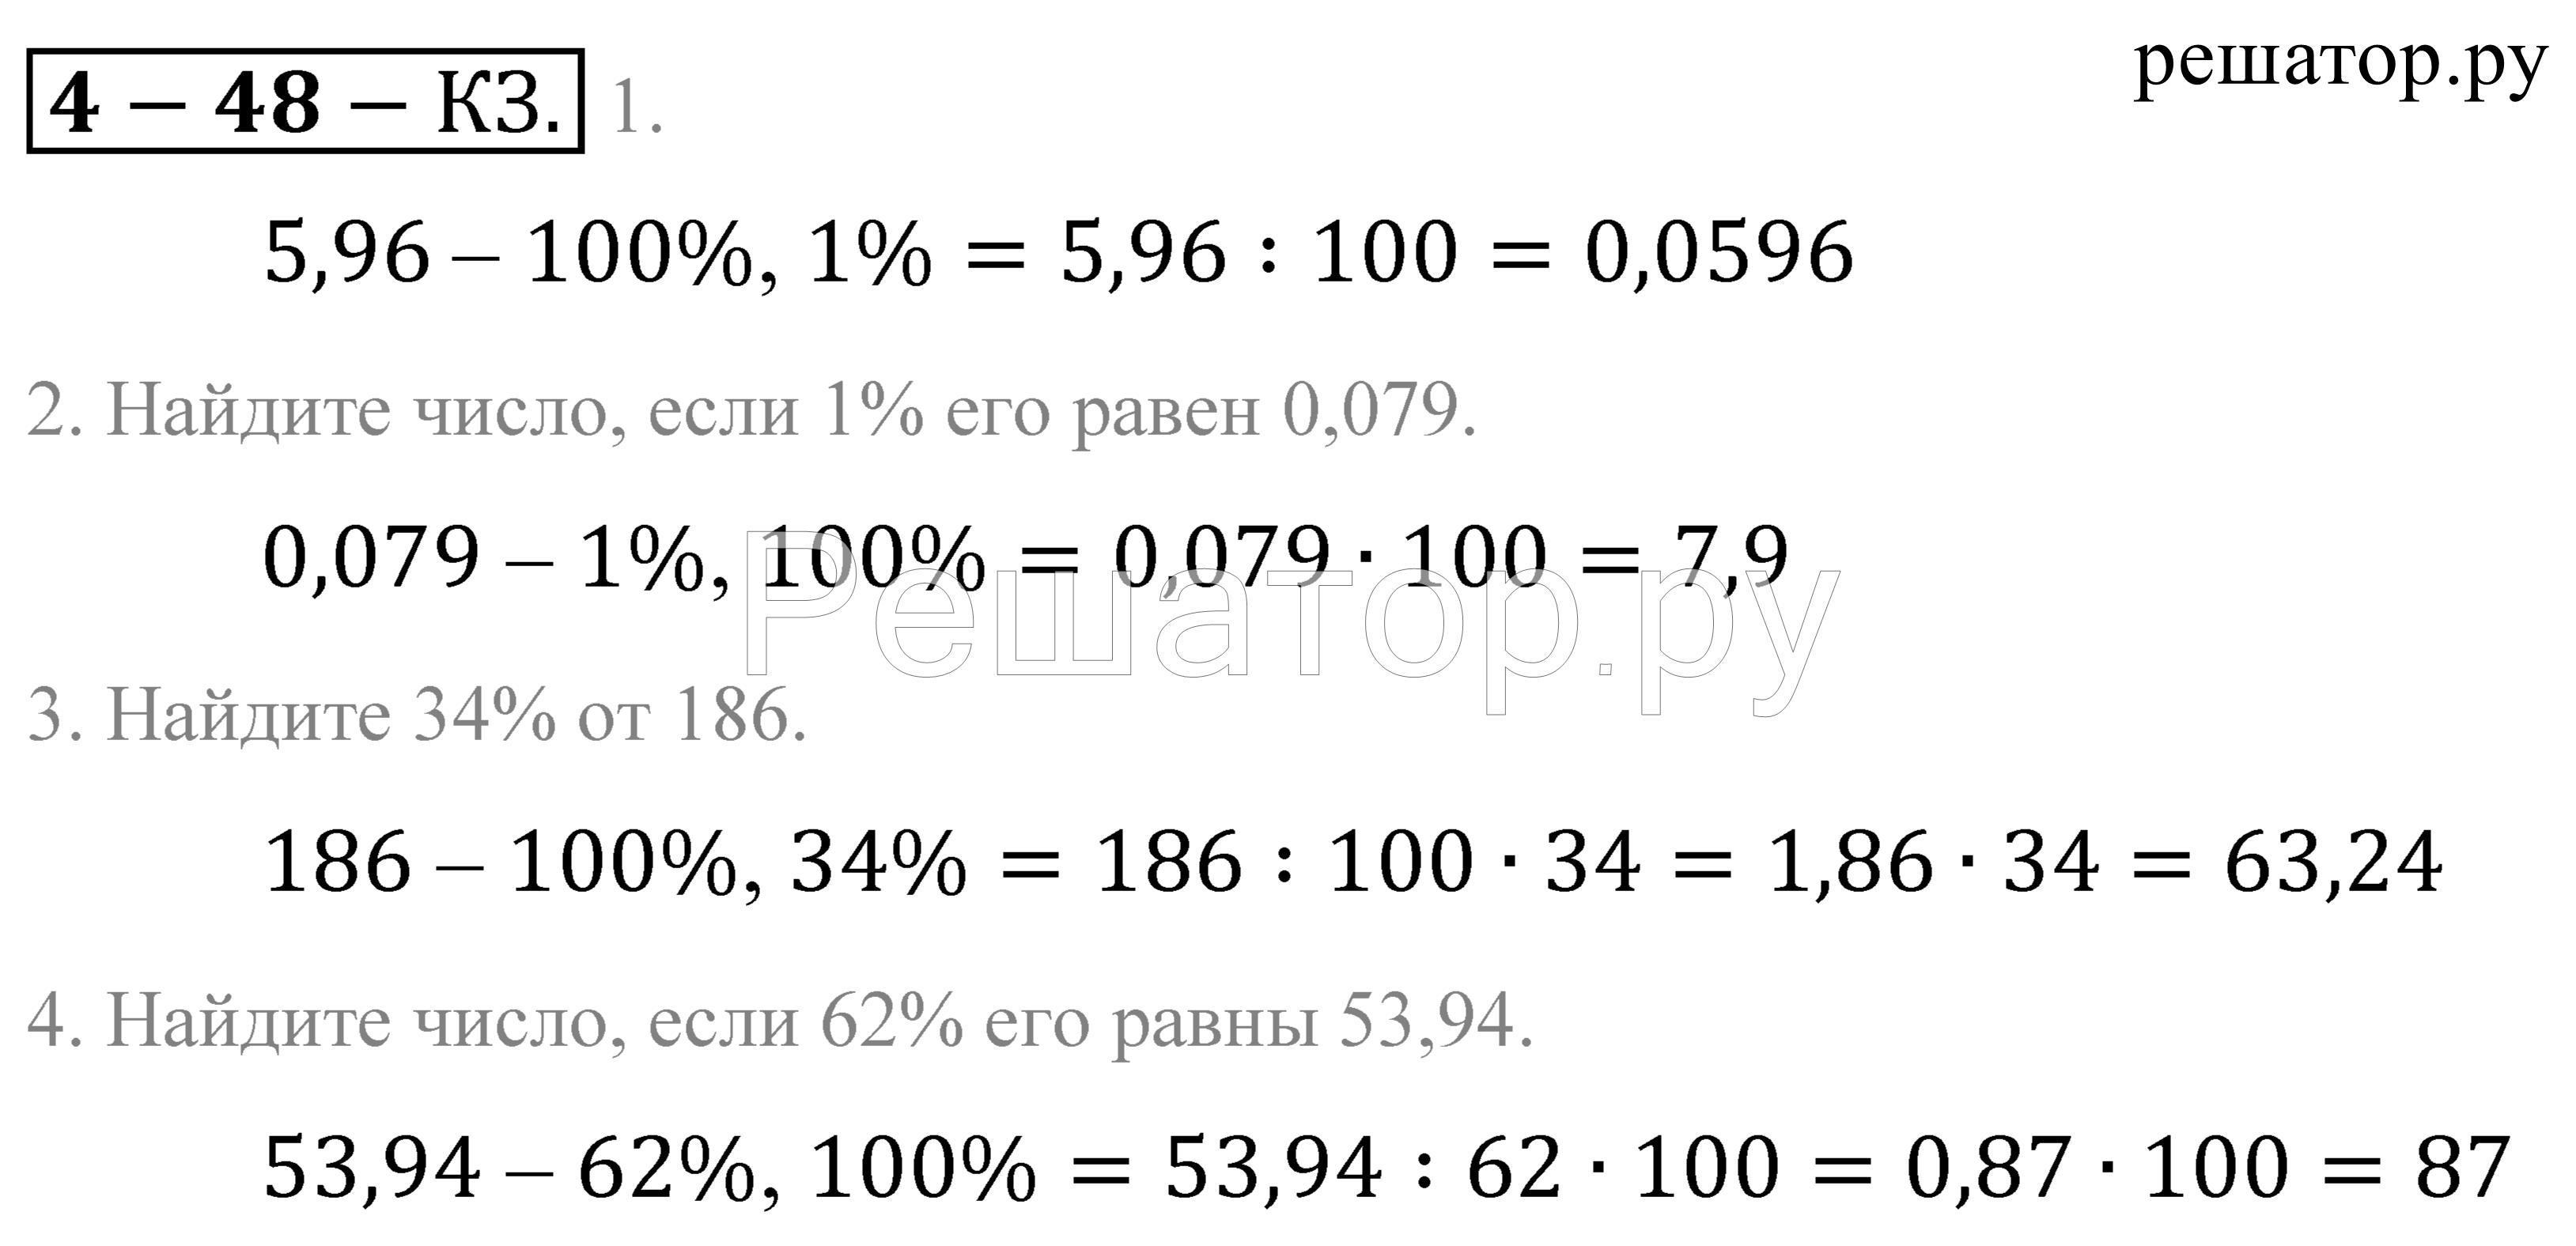 Решебник задач на процент